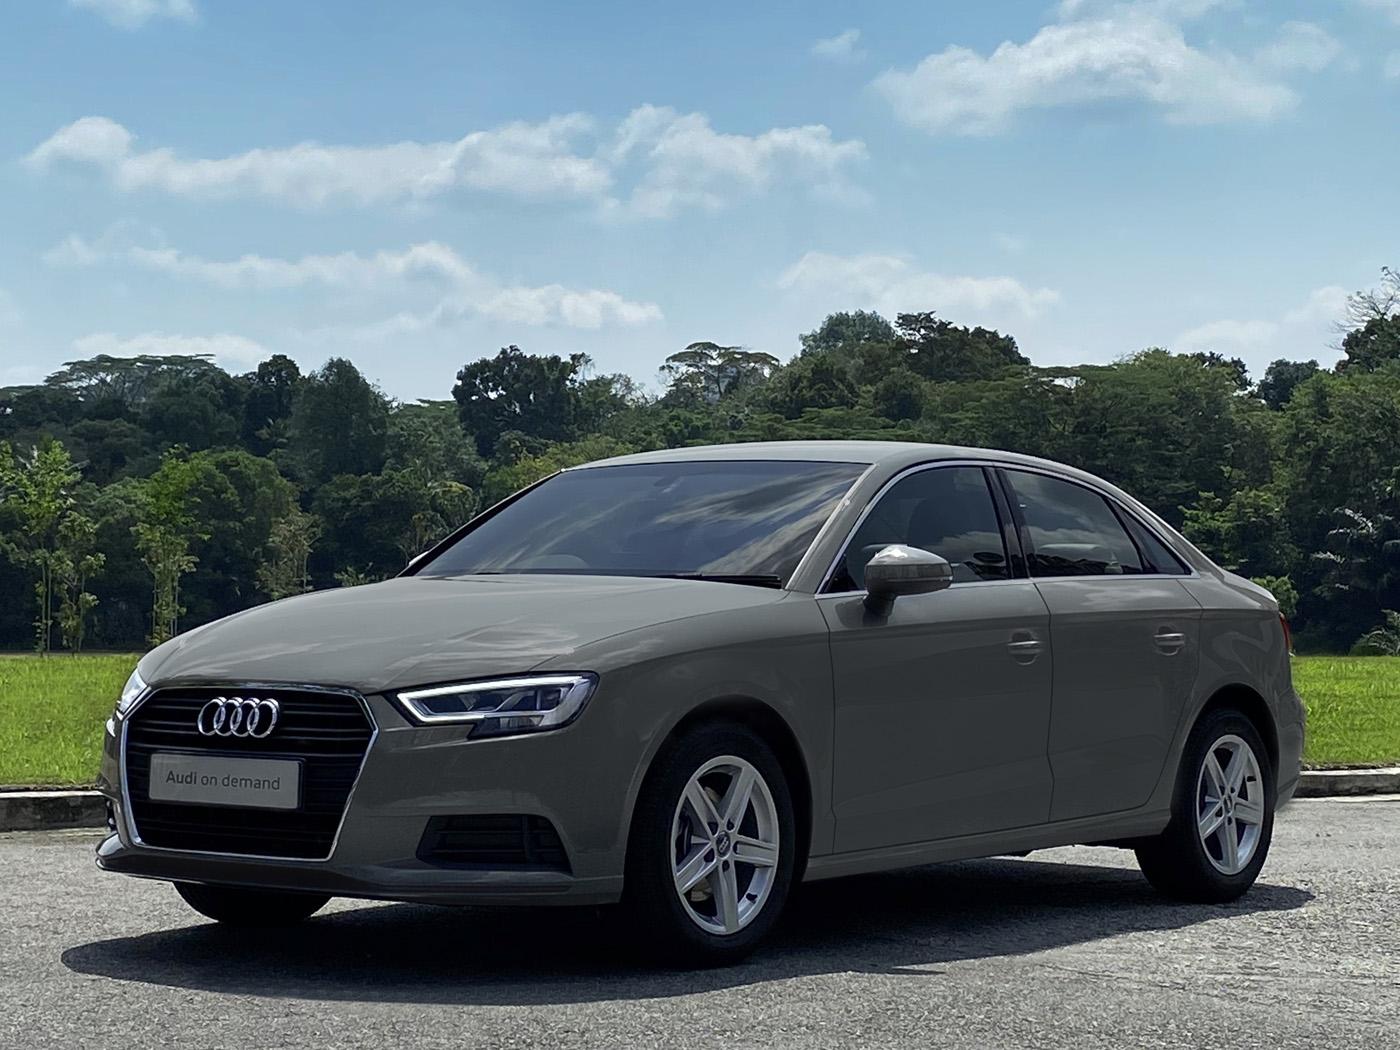 Audi A3 Sedan 1.0 TFSI S tronic (For Rent)